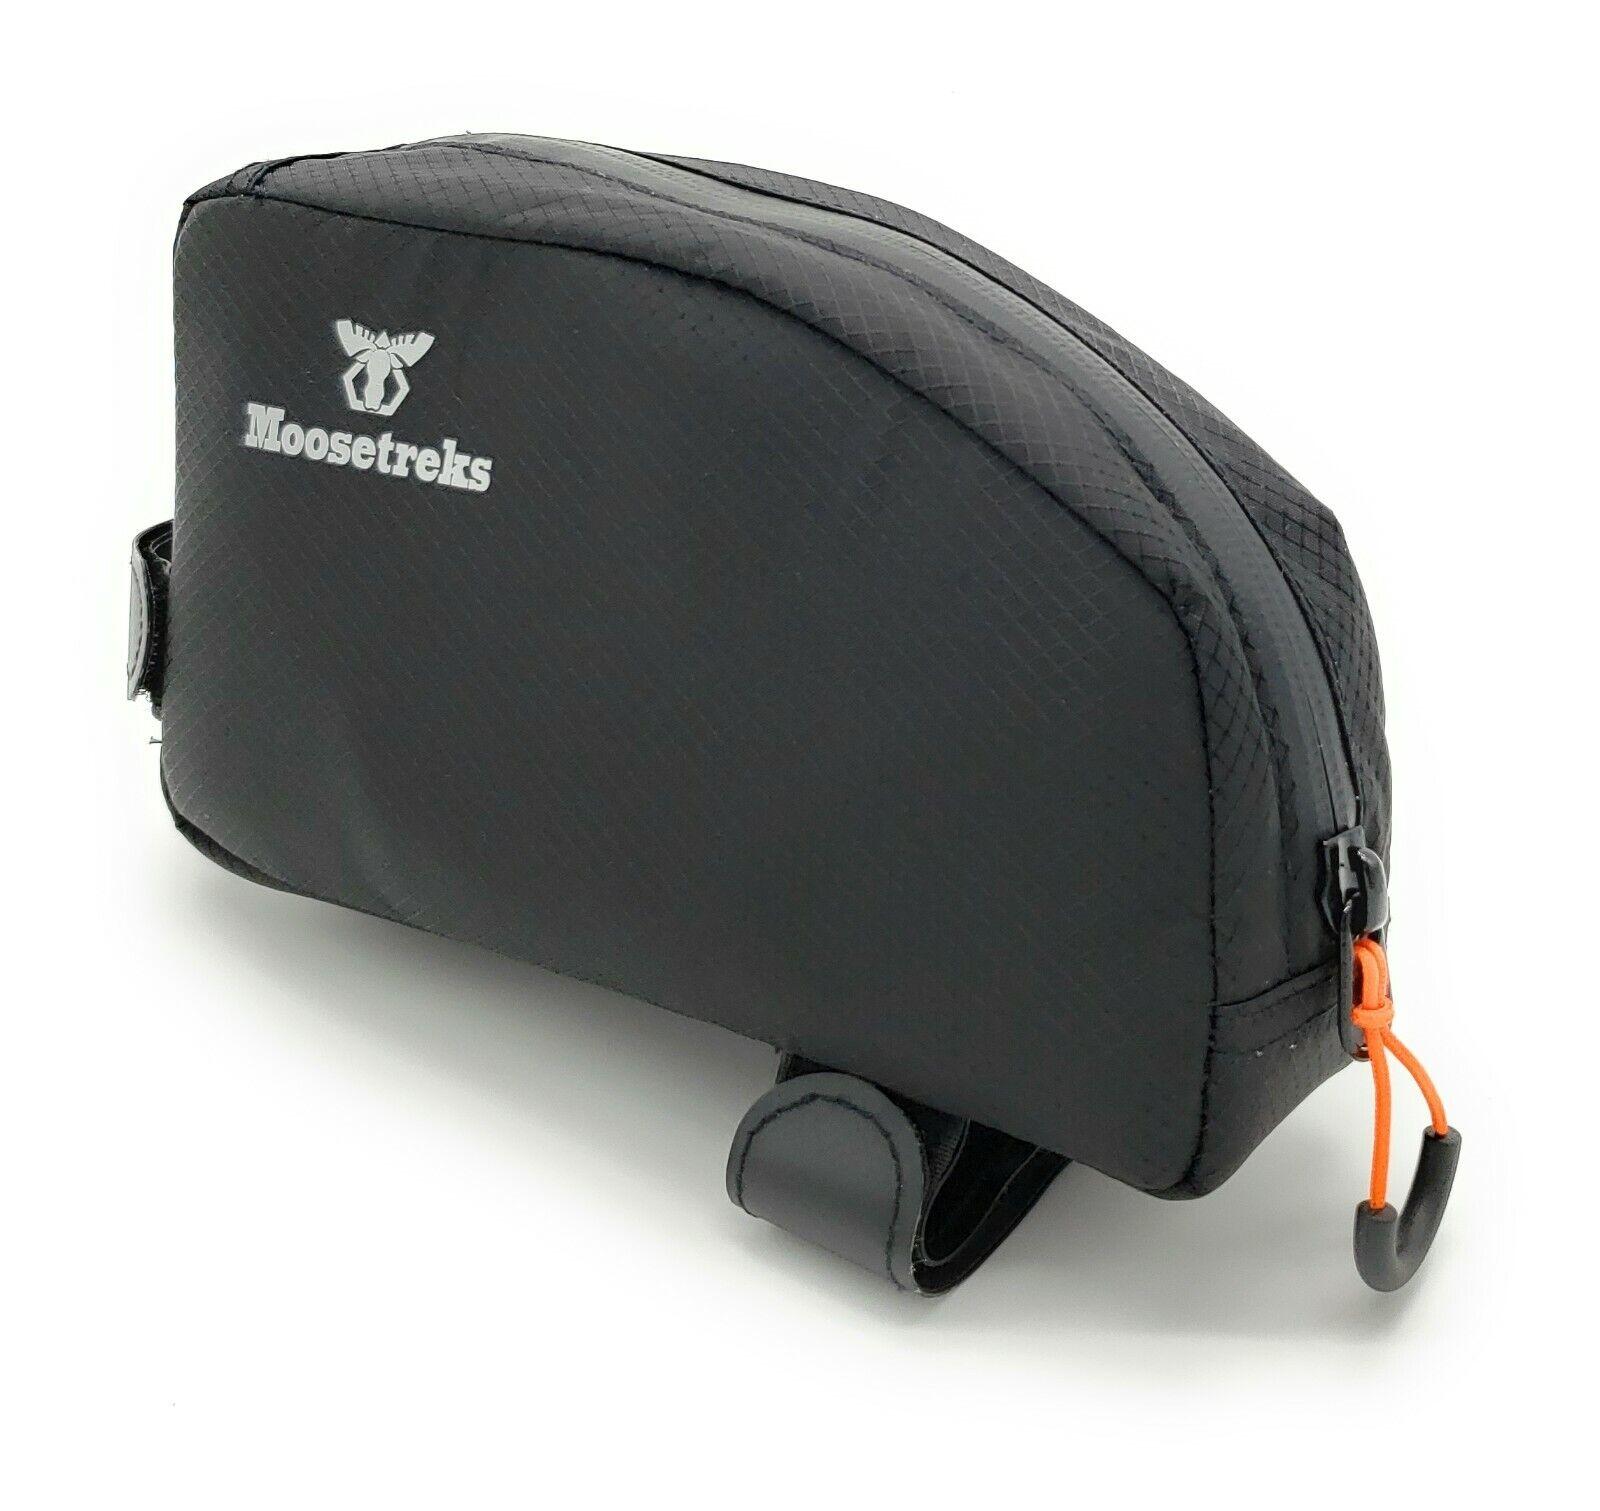 Moosetreks Bike Top Tube BagFuel-Tank Style Bike Packing Bag with Easy 1 Hand